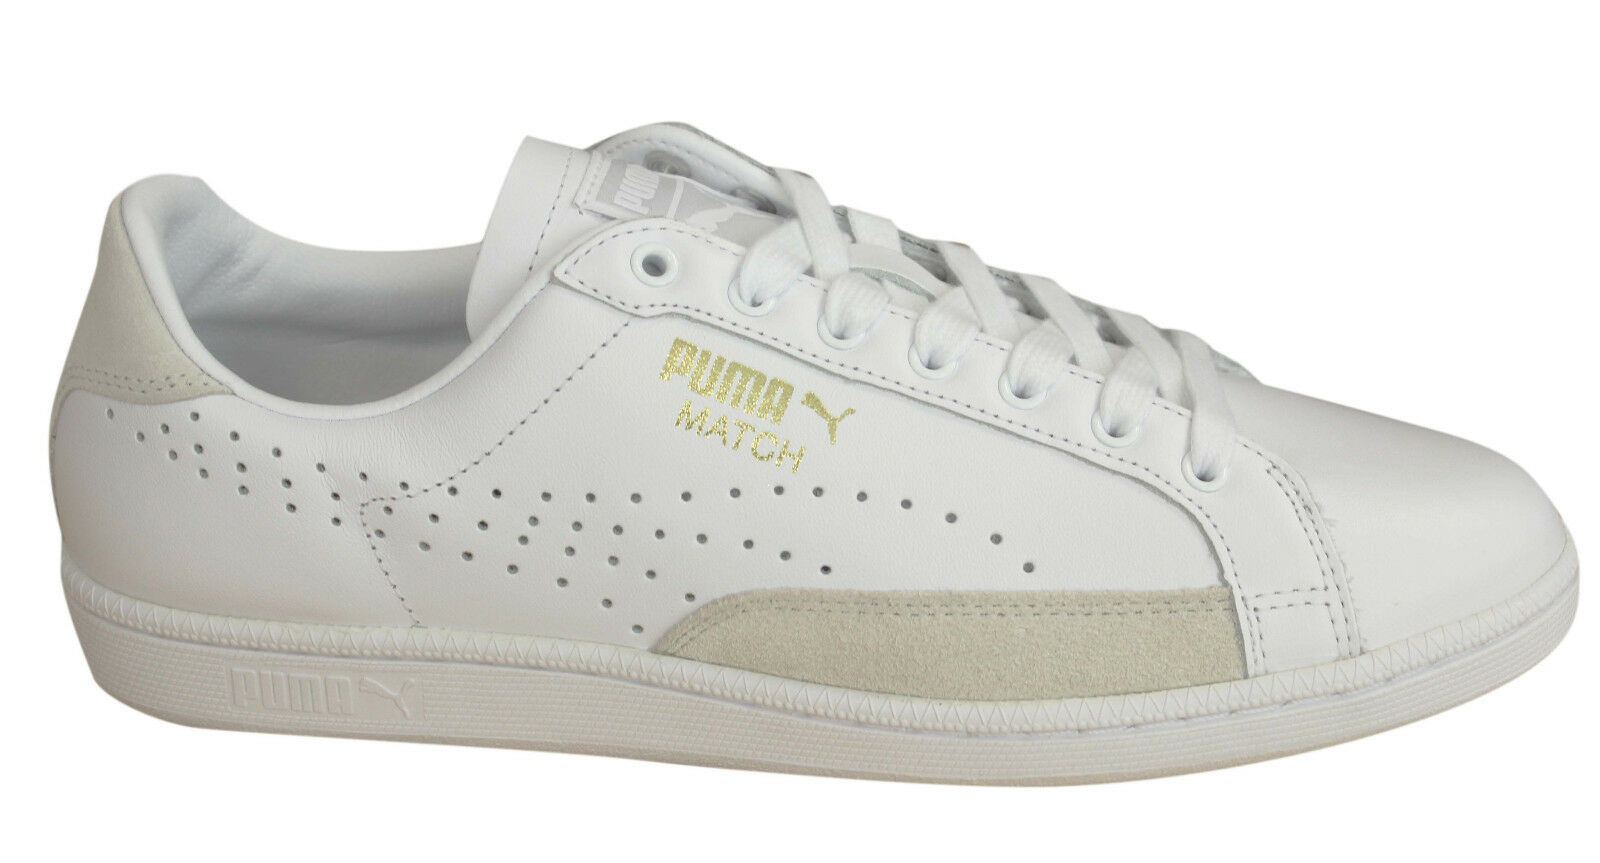 da3ea9fae7dd PUMA Mens Match 74 Trainers Tennis Sports Shoes SNEAKERS White Gold ...